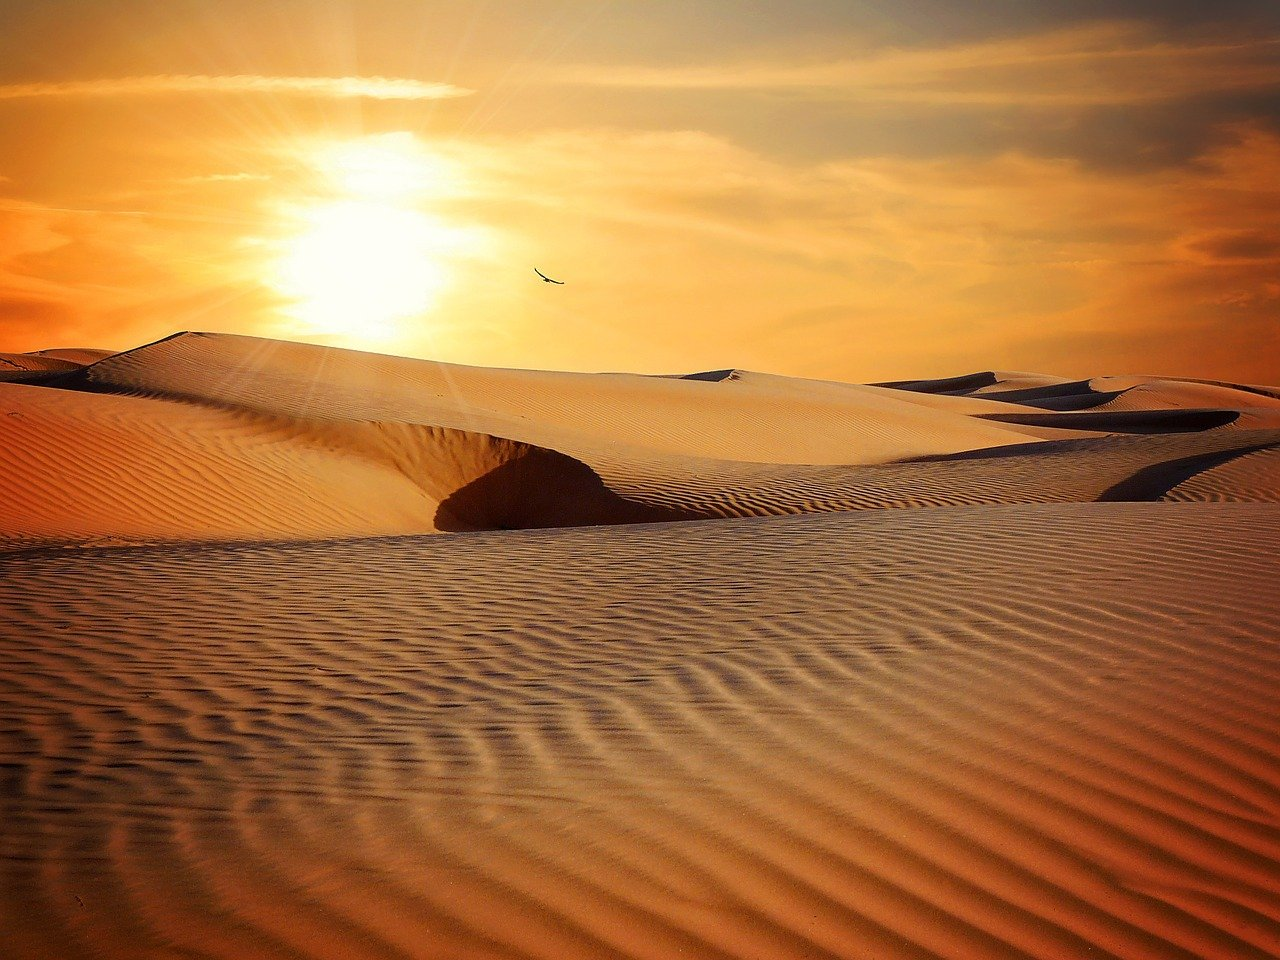 temperatura do deserto à noite